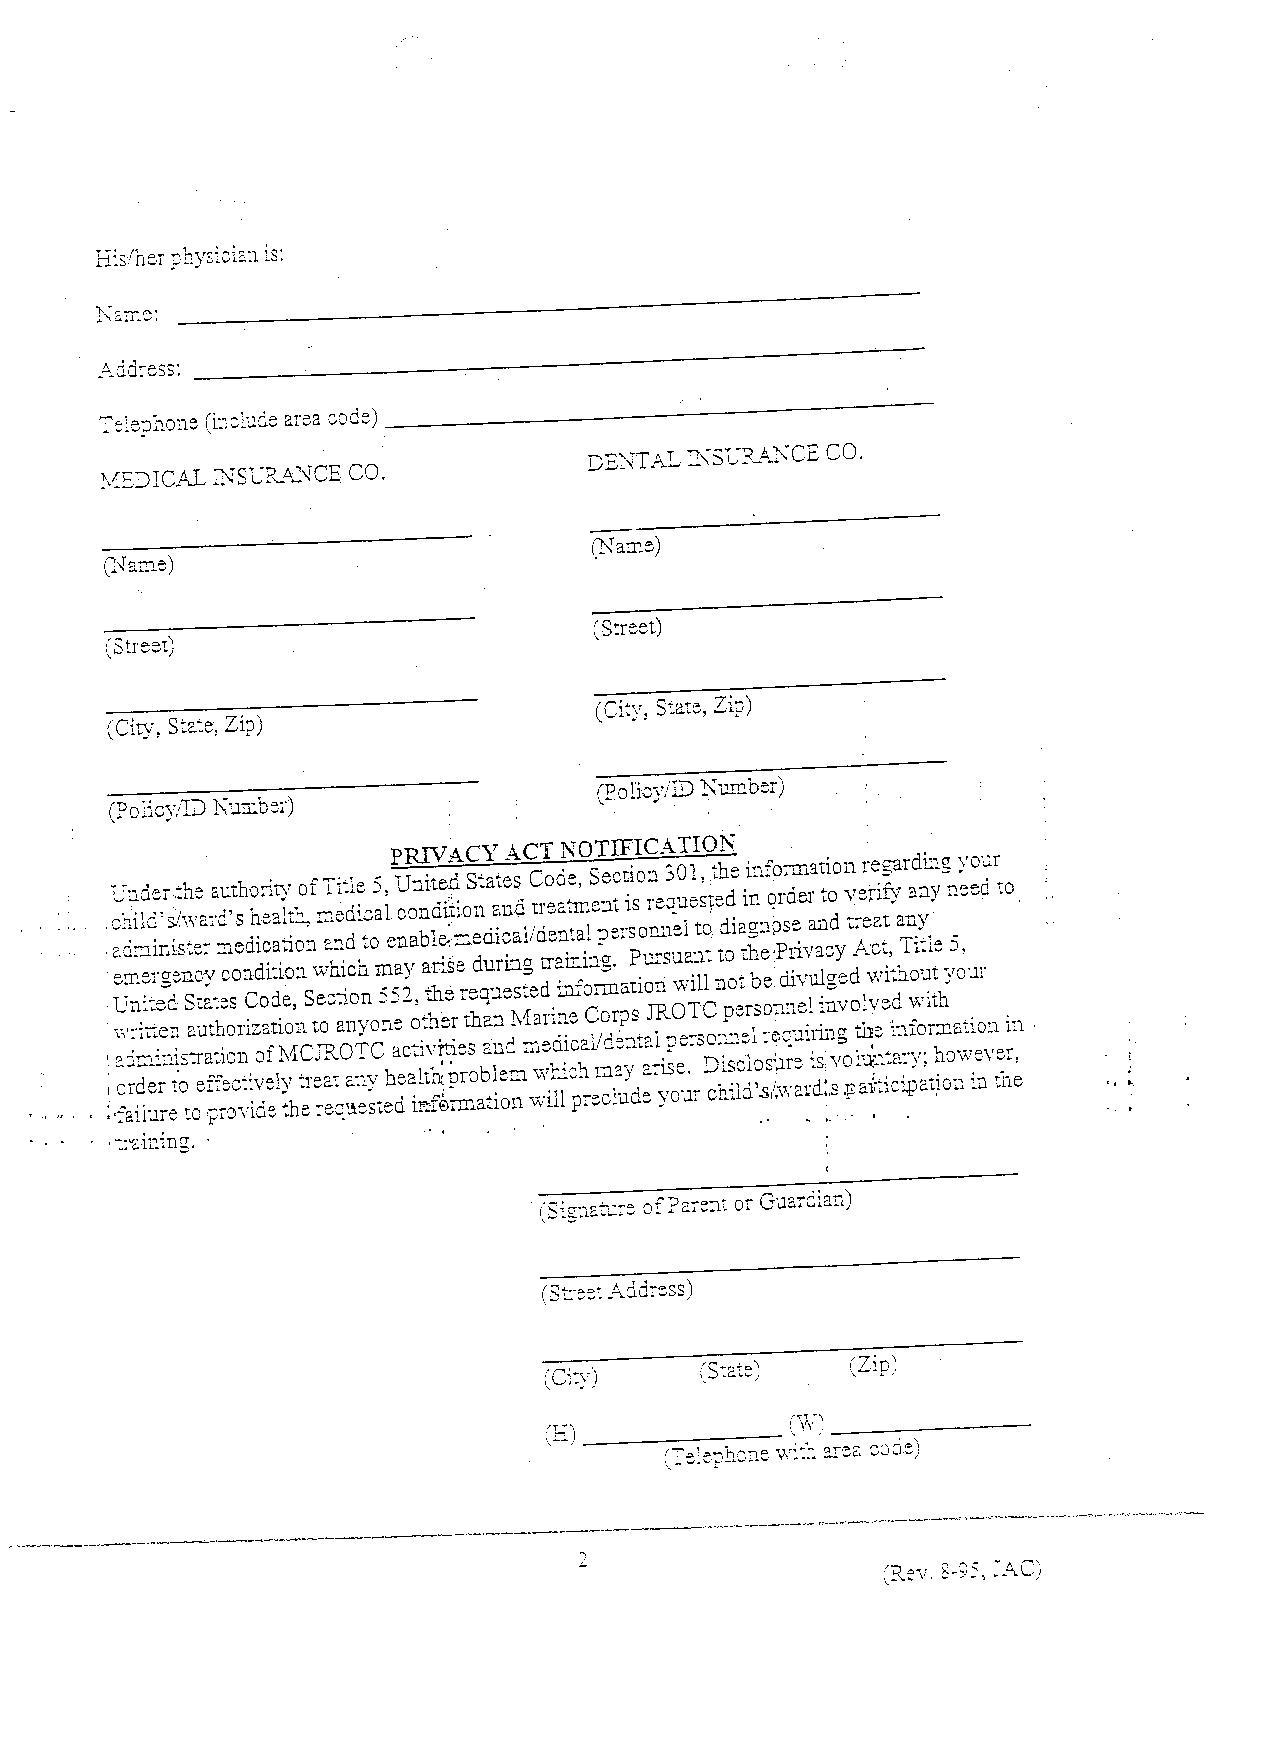 Marine_JROTC: Standard Release Form Back